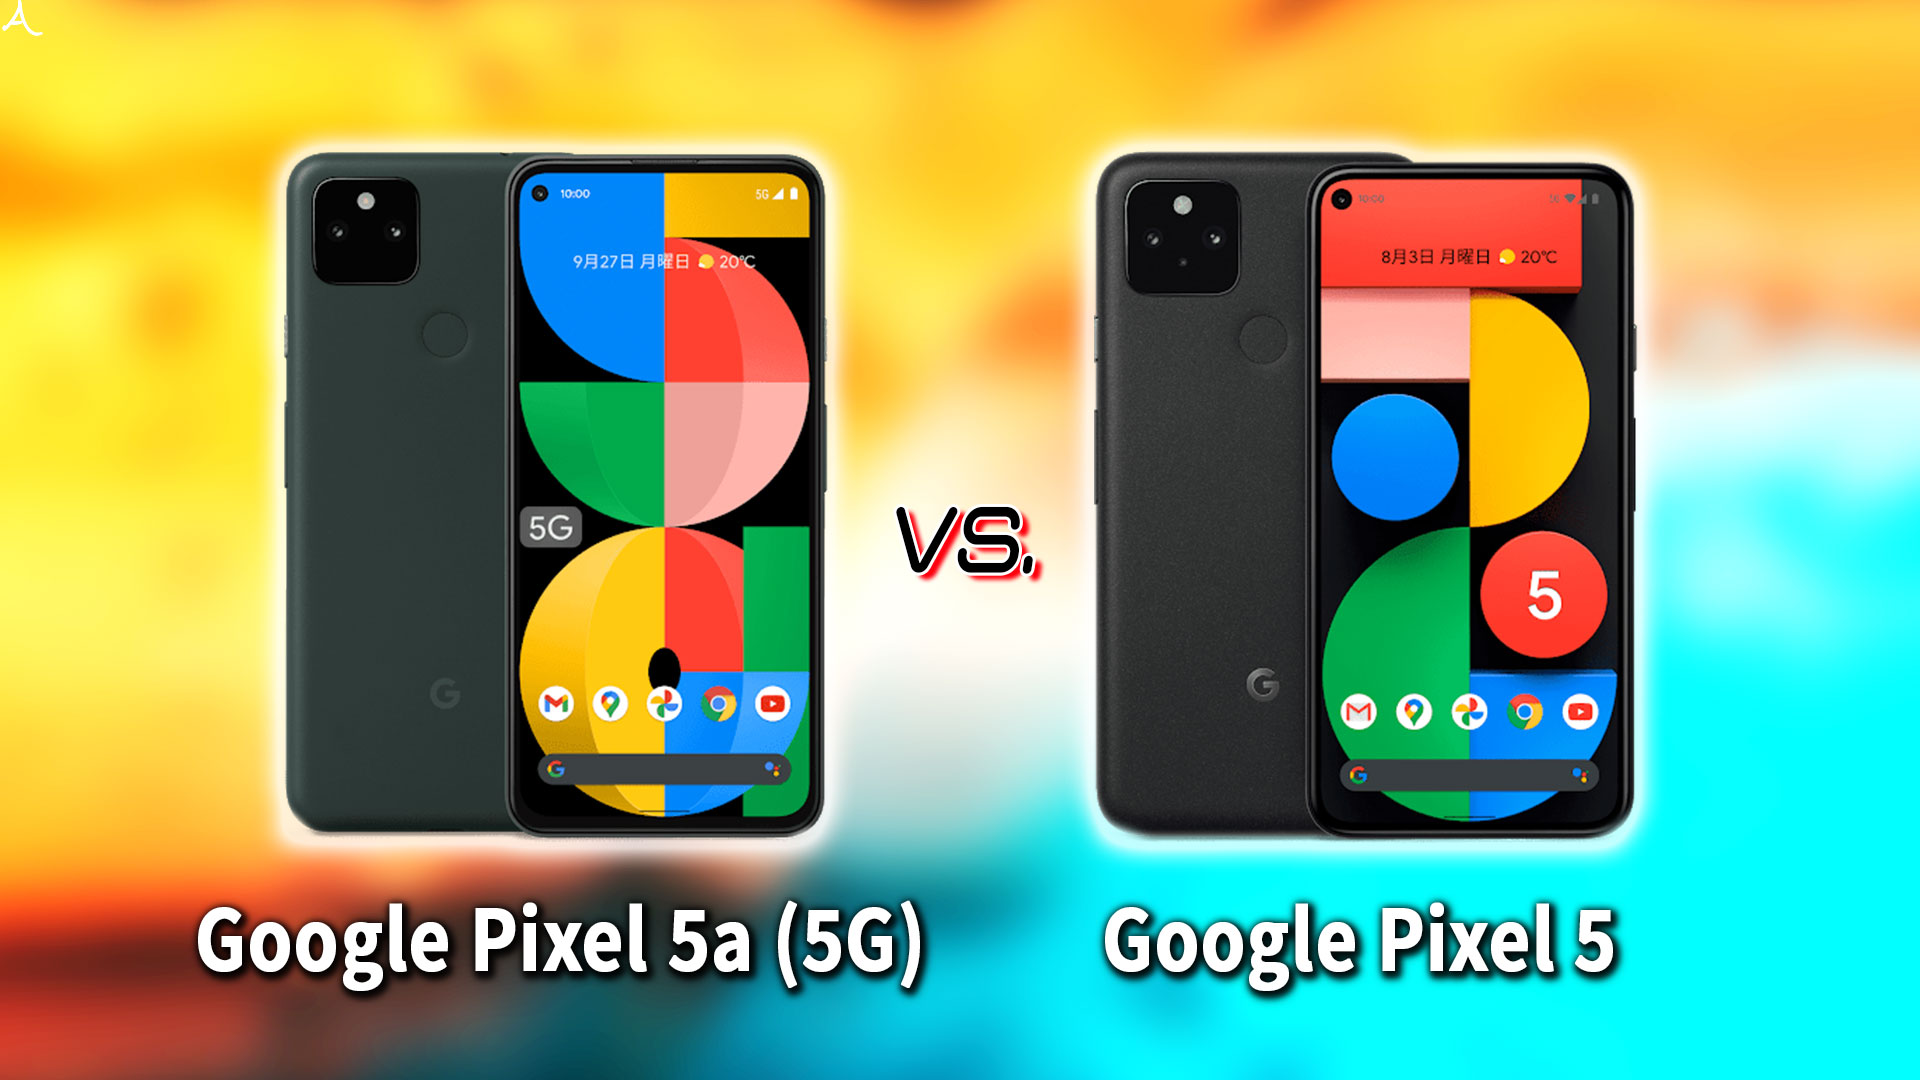 「Google Pixel 5a (5G)」と「Pixel 5」の違いを比較:どっちを買う?